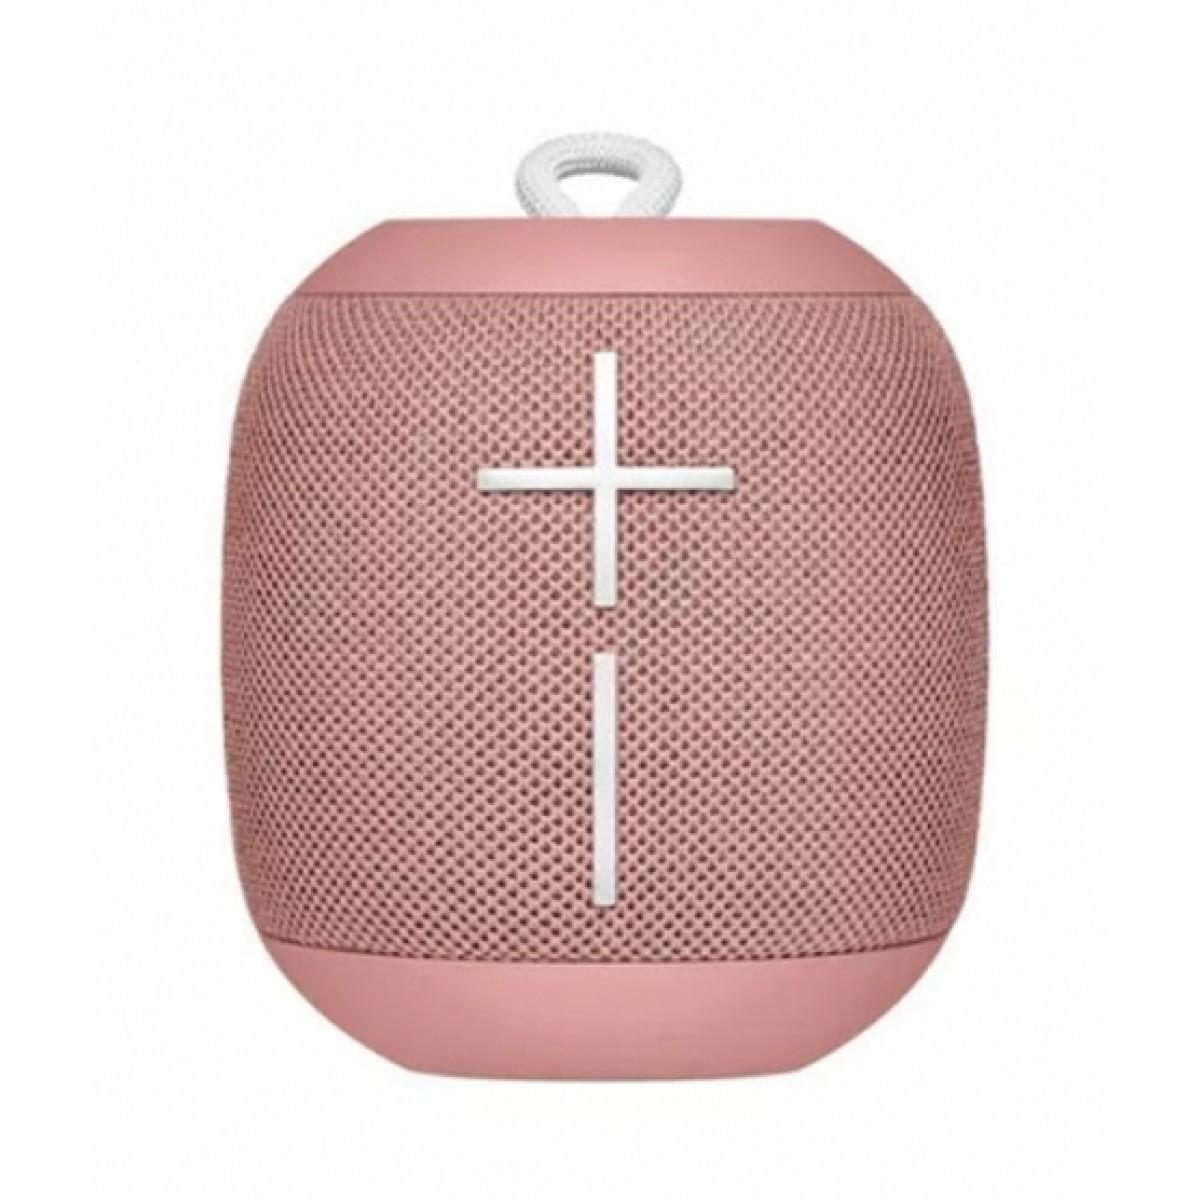 Logitech Ultimate Ears Wonderboom Portable Bluetooth Speaker Pink (984-000872)